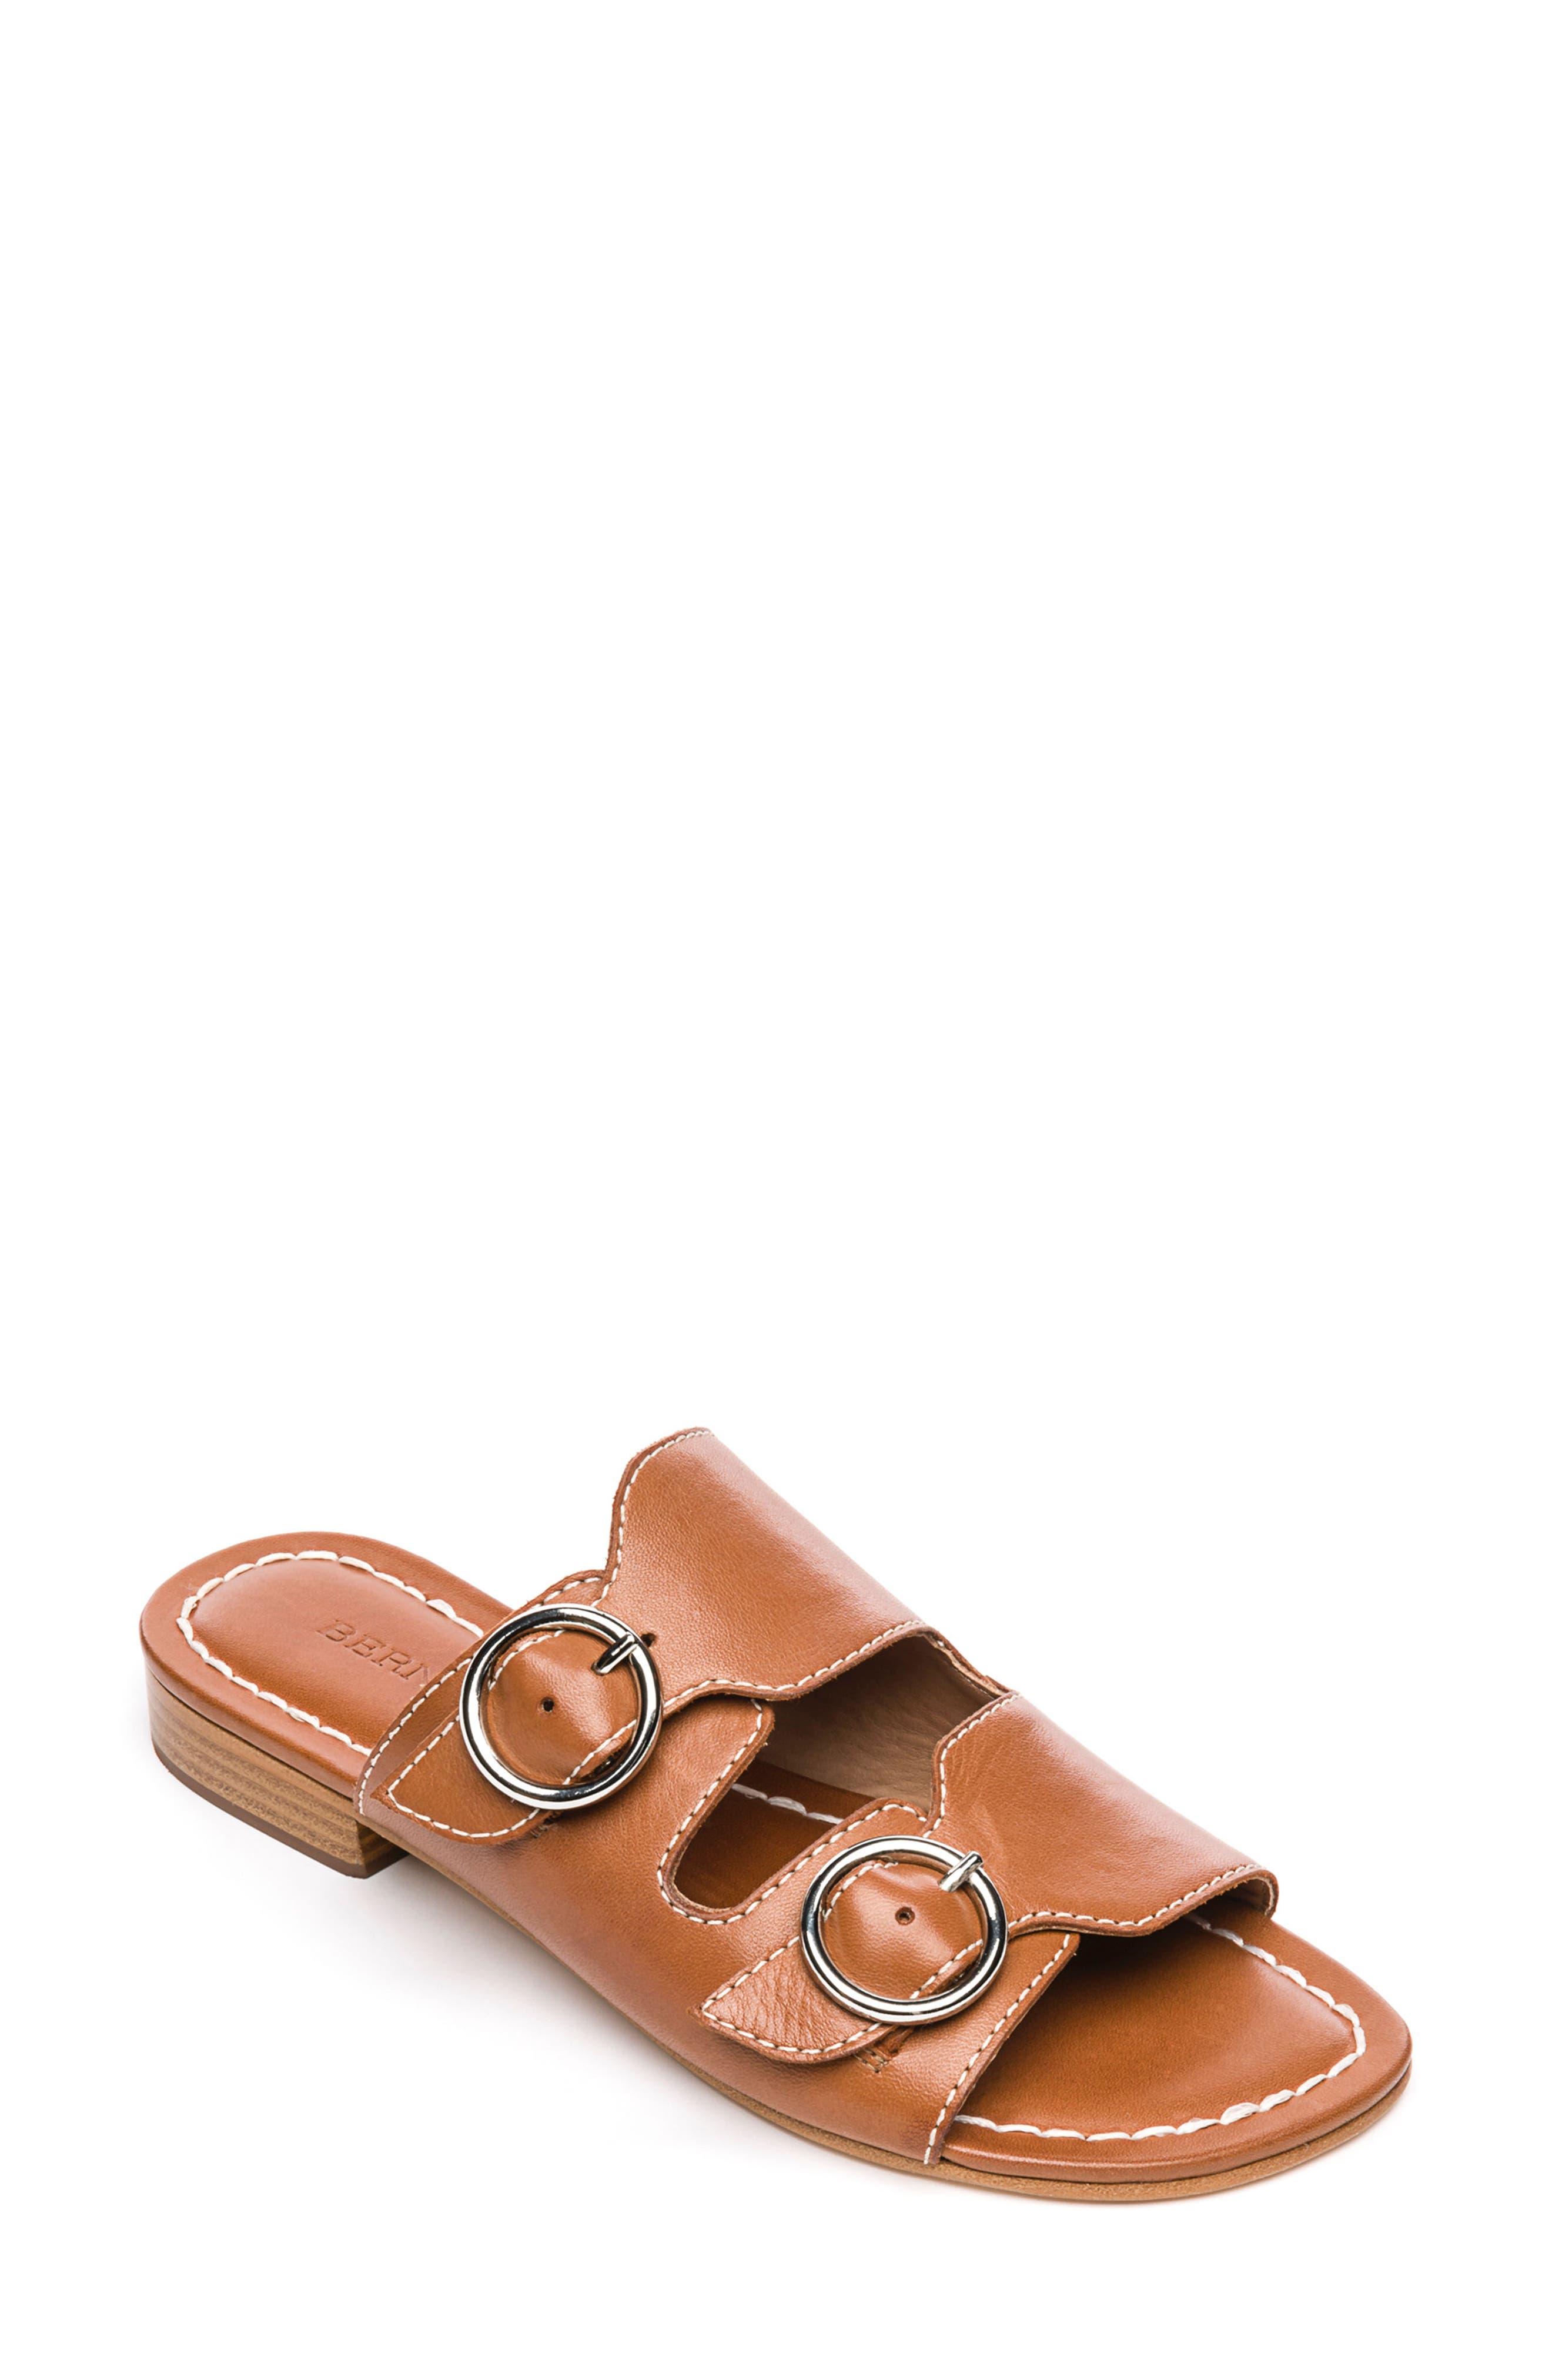 Bernardo Tobi Slide Sandal,                         Main,                         color, Luggage Leather